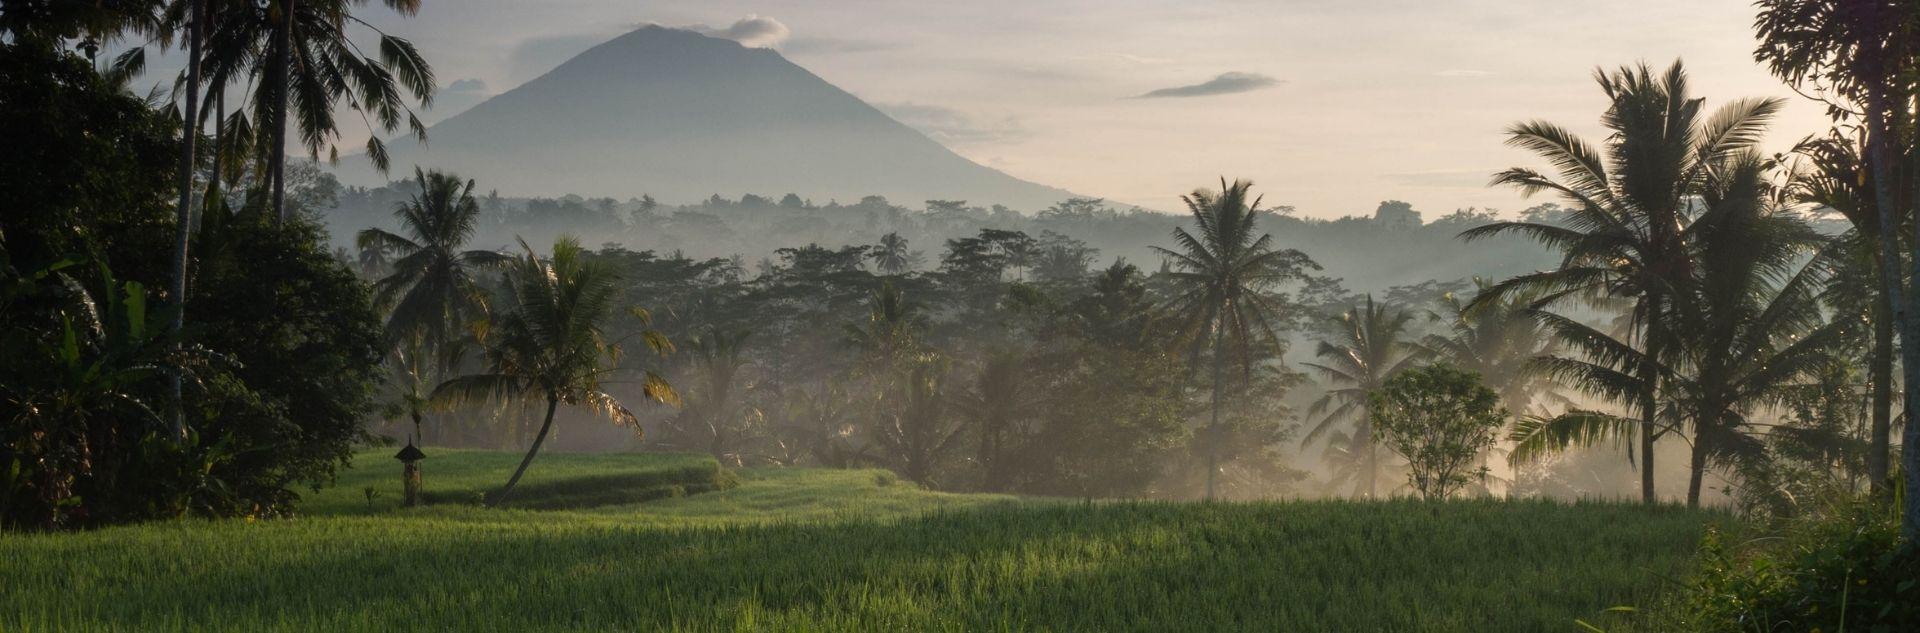 Fernreise Indonesien - Bali